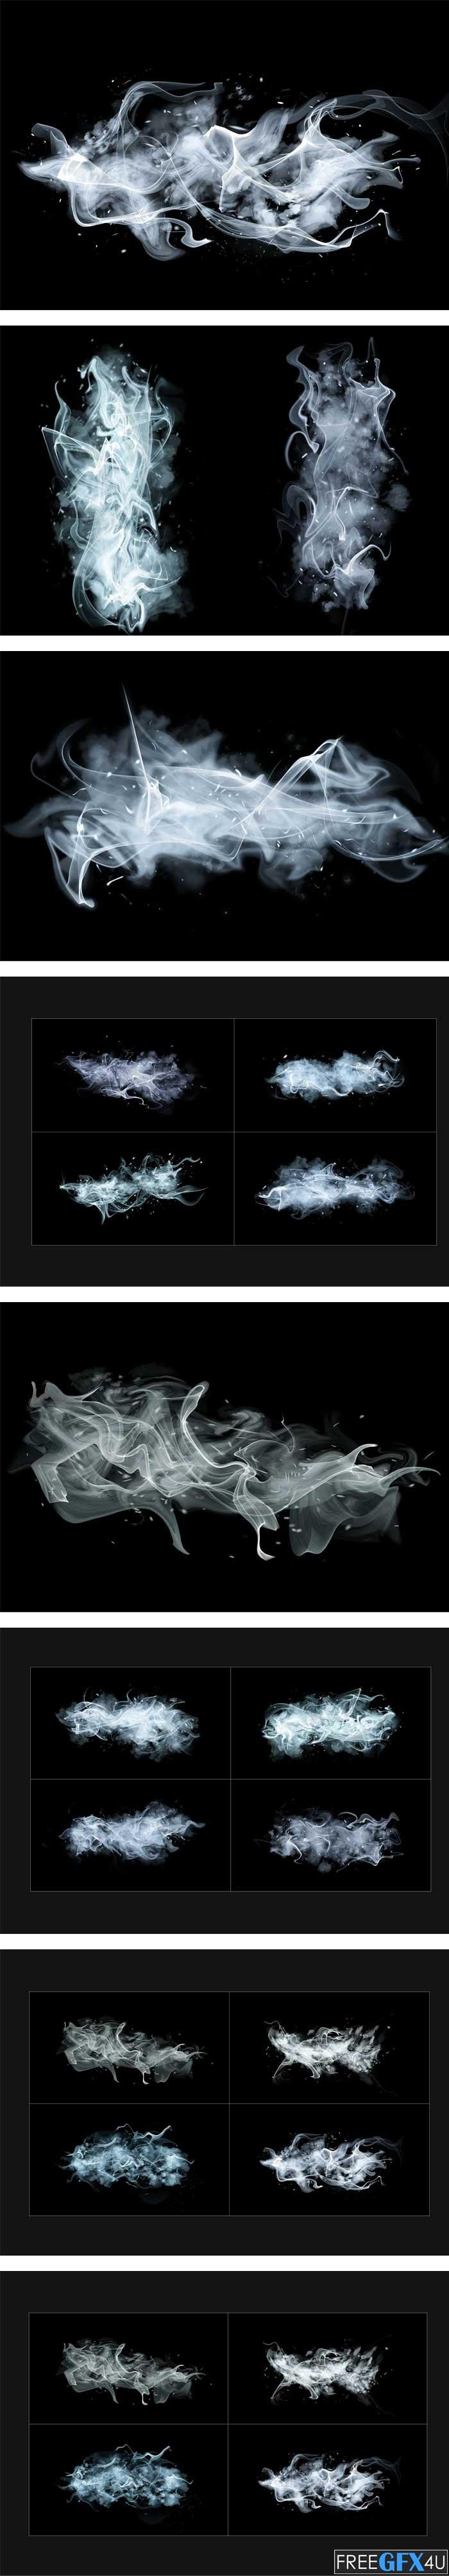 White Smoke Transparent PNG & PSD